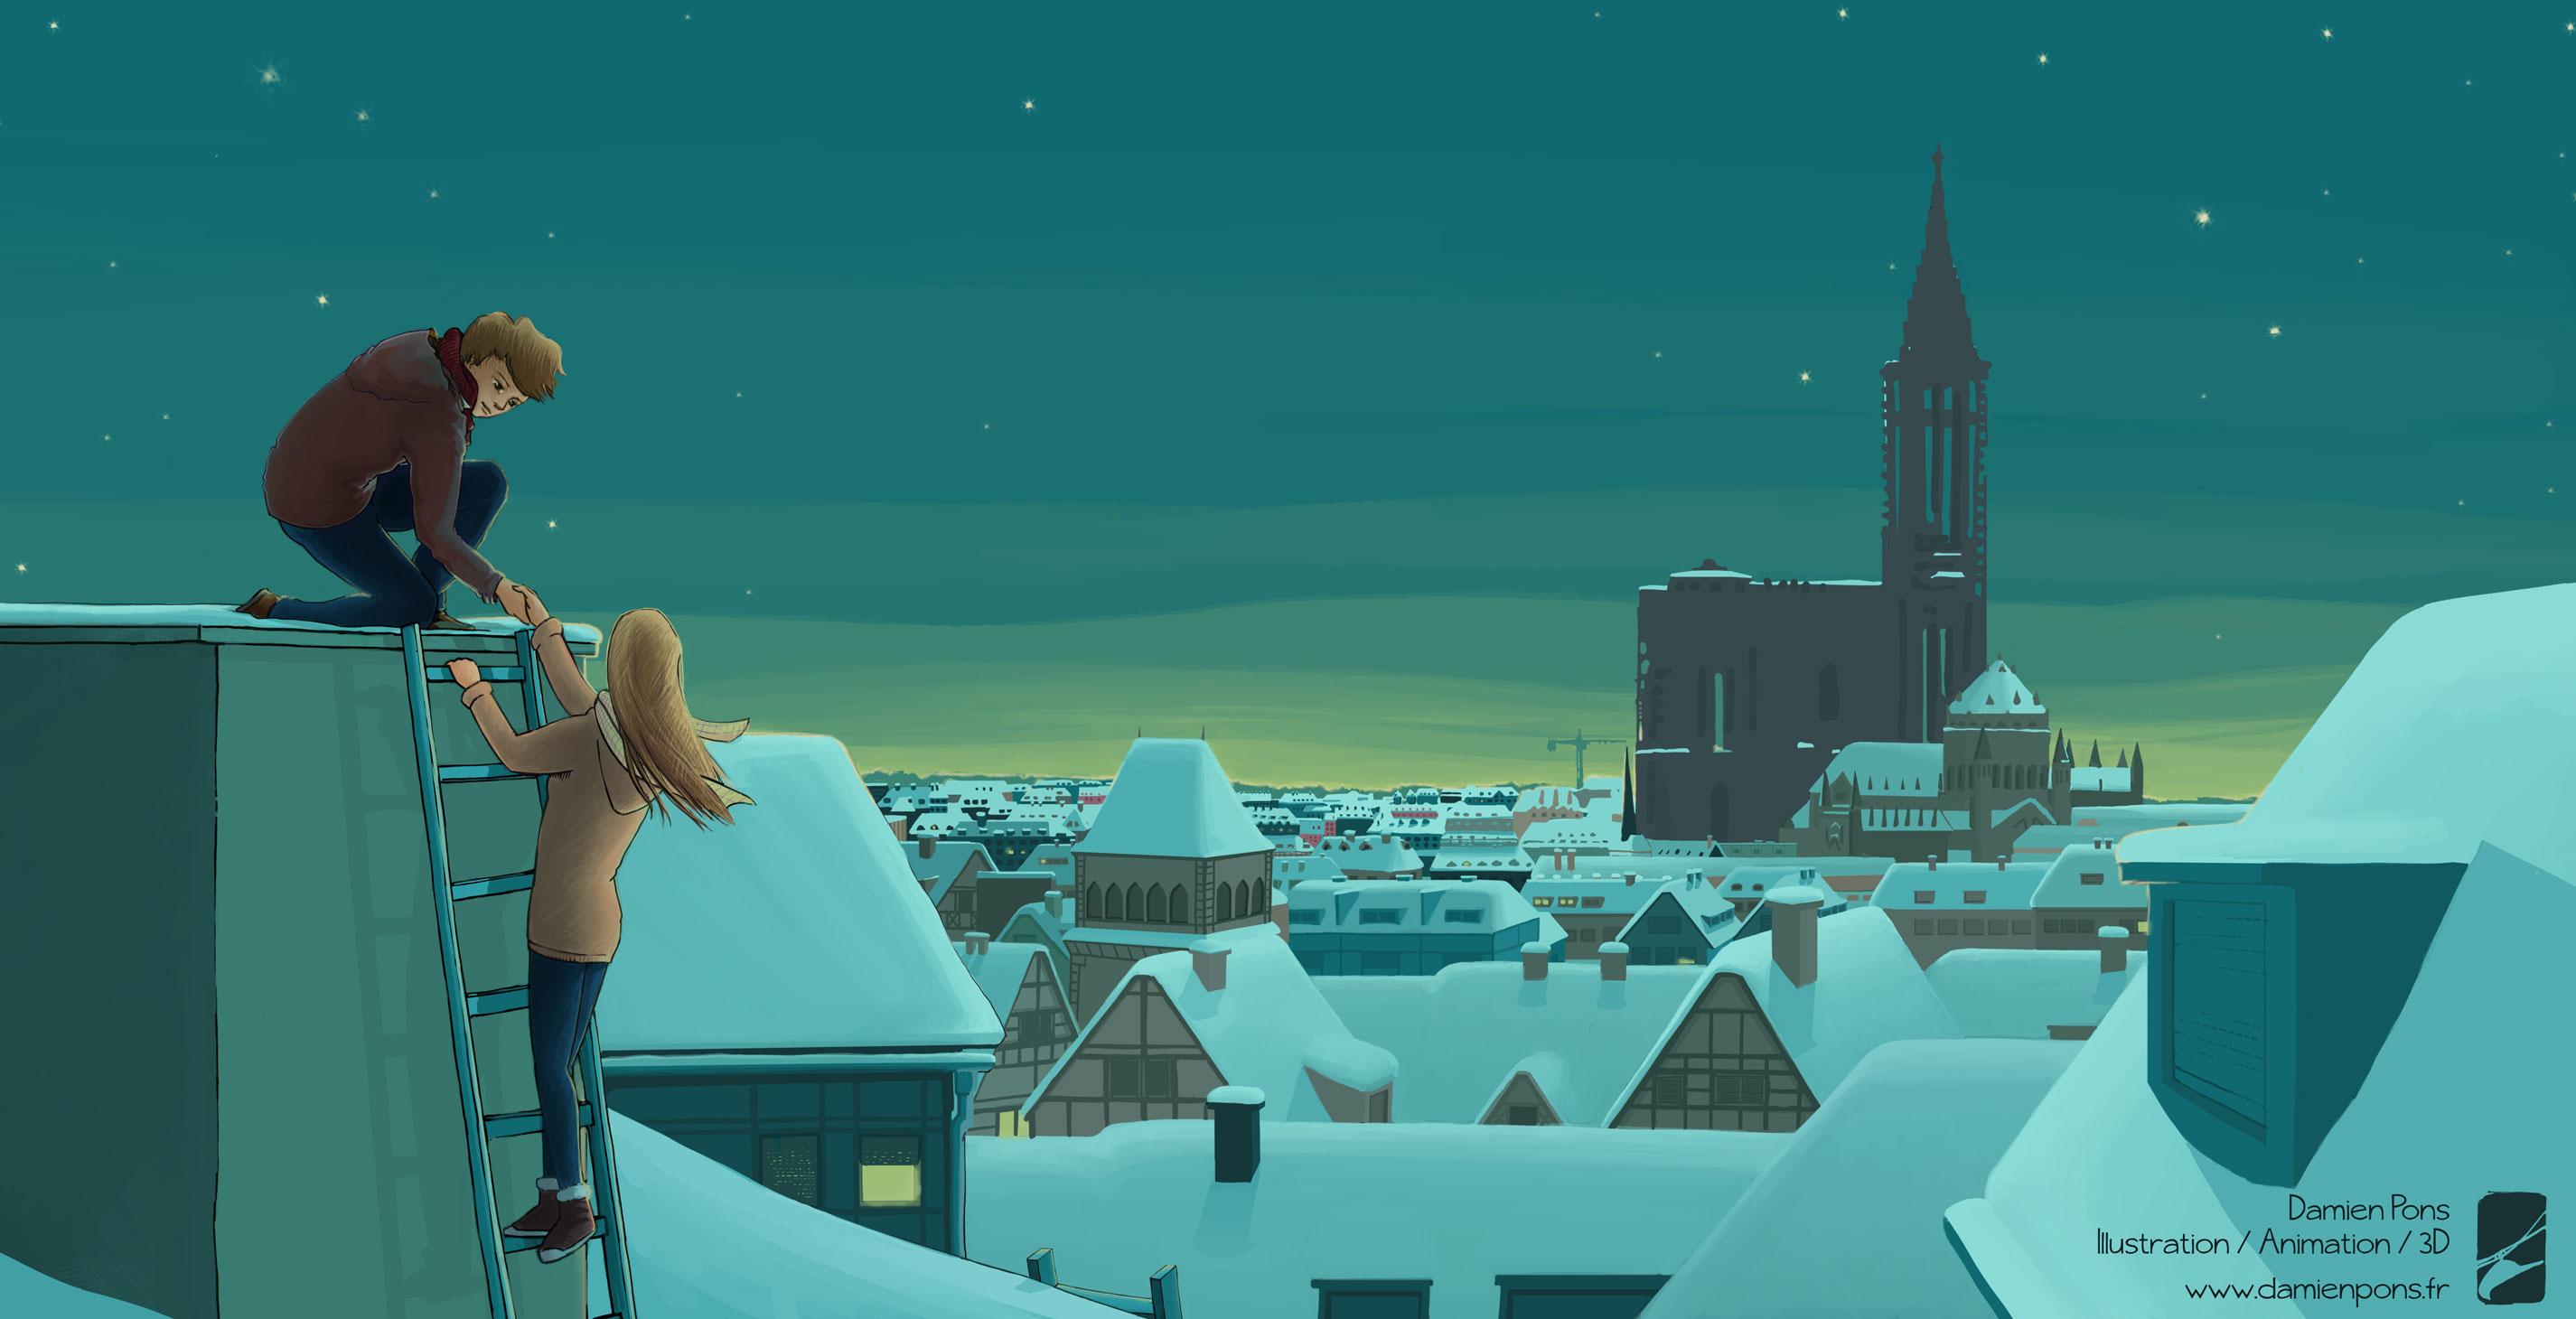 bonne année 2015 illustration Damien Pons